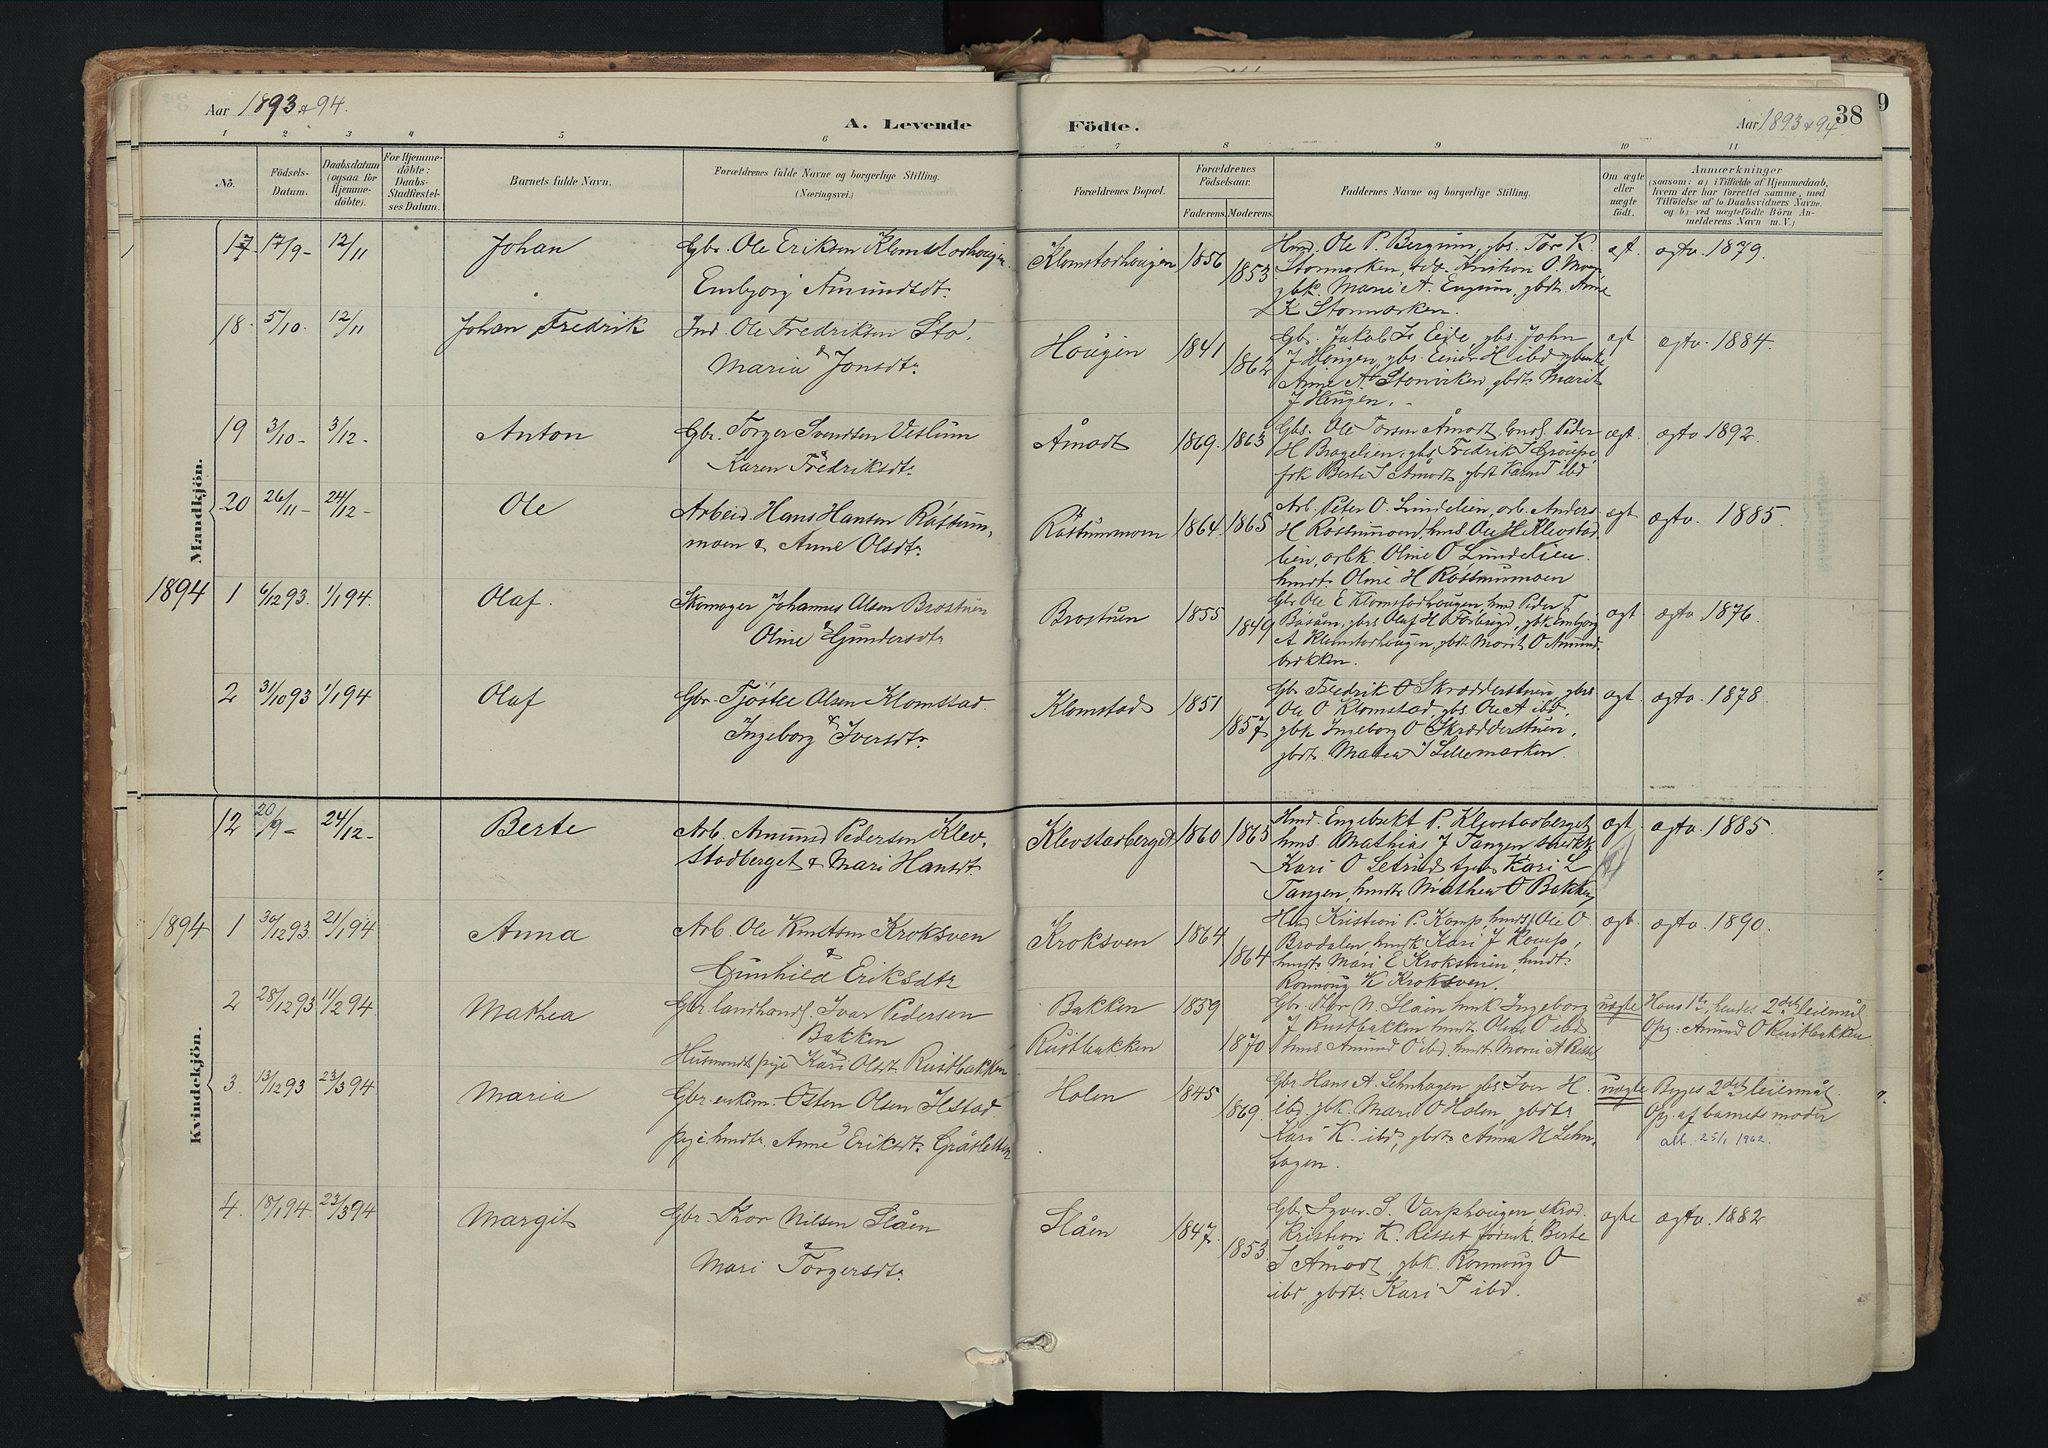 SAH, Nord-Fron prestekontor, Ministerialbok nr. 3, 1884-1914, s. 38